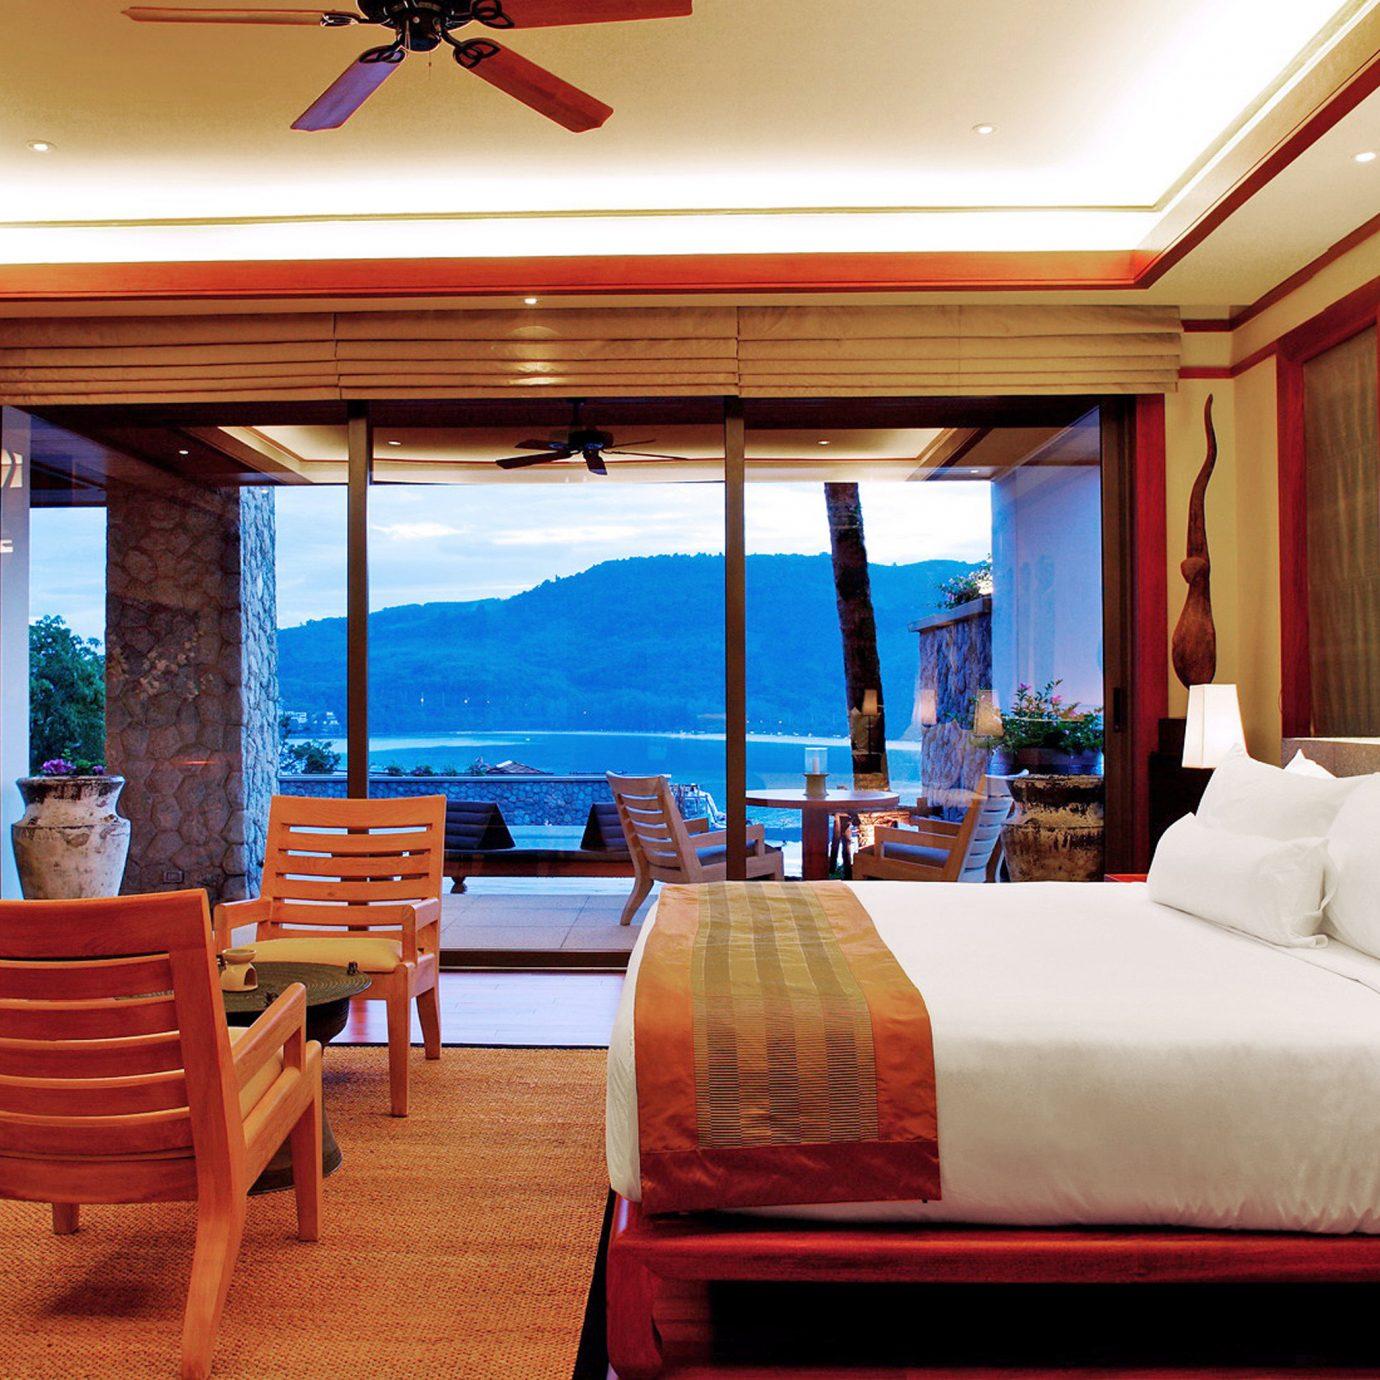 Balcony Beach Beachfront Bedroom Hotels Scenic views Tropical Waterfront Resort Suite restaurant Villa